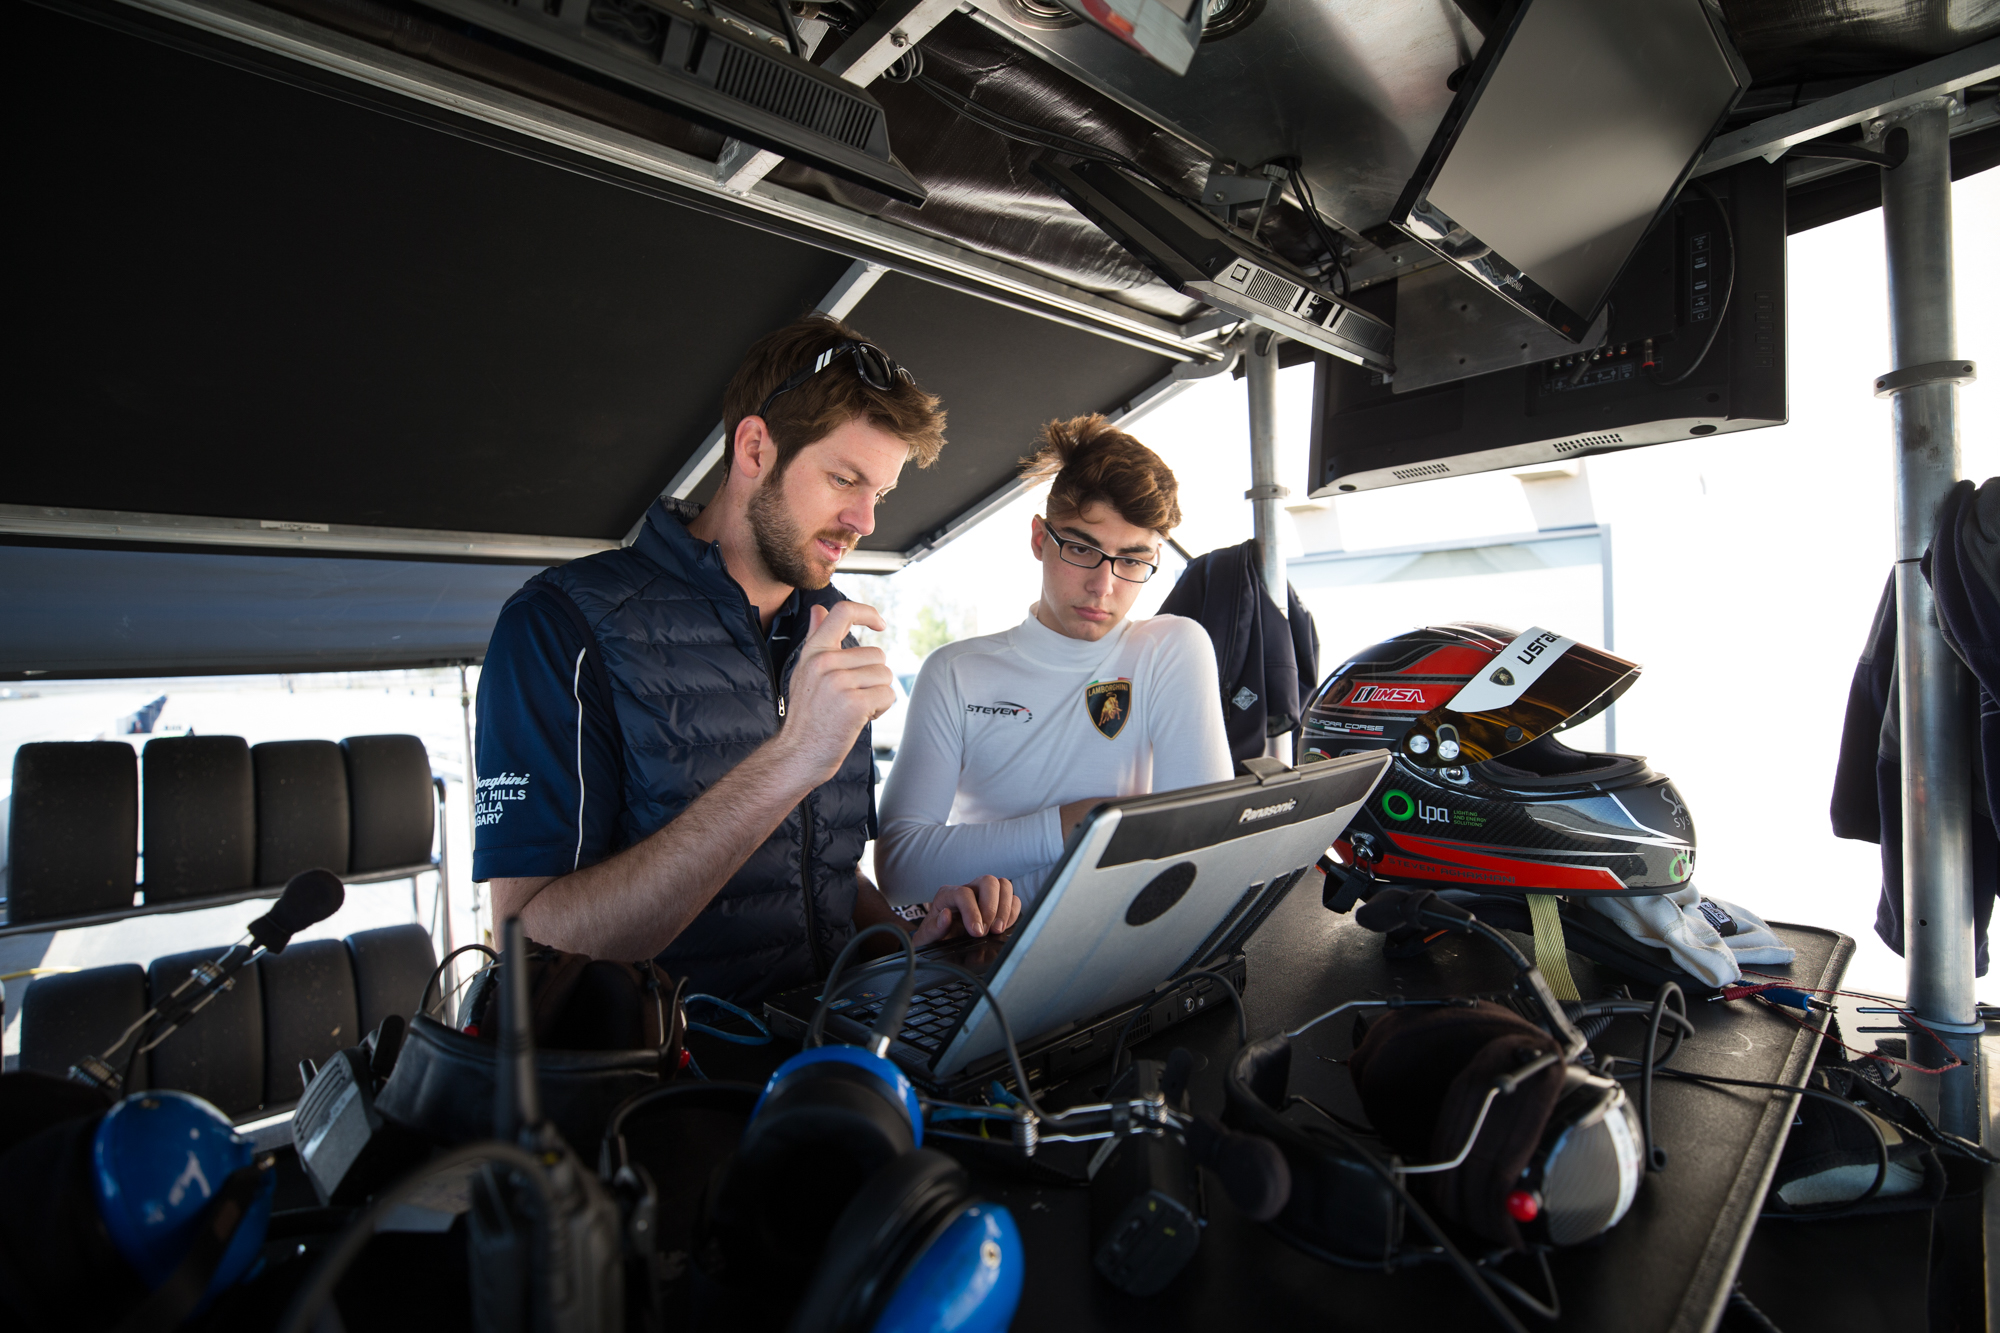 Steven-Racing-20180221-73277.jpg